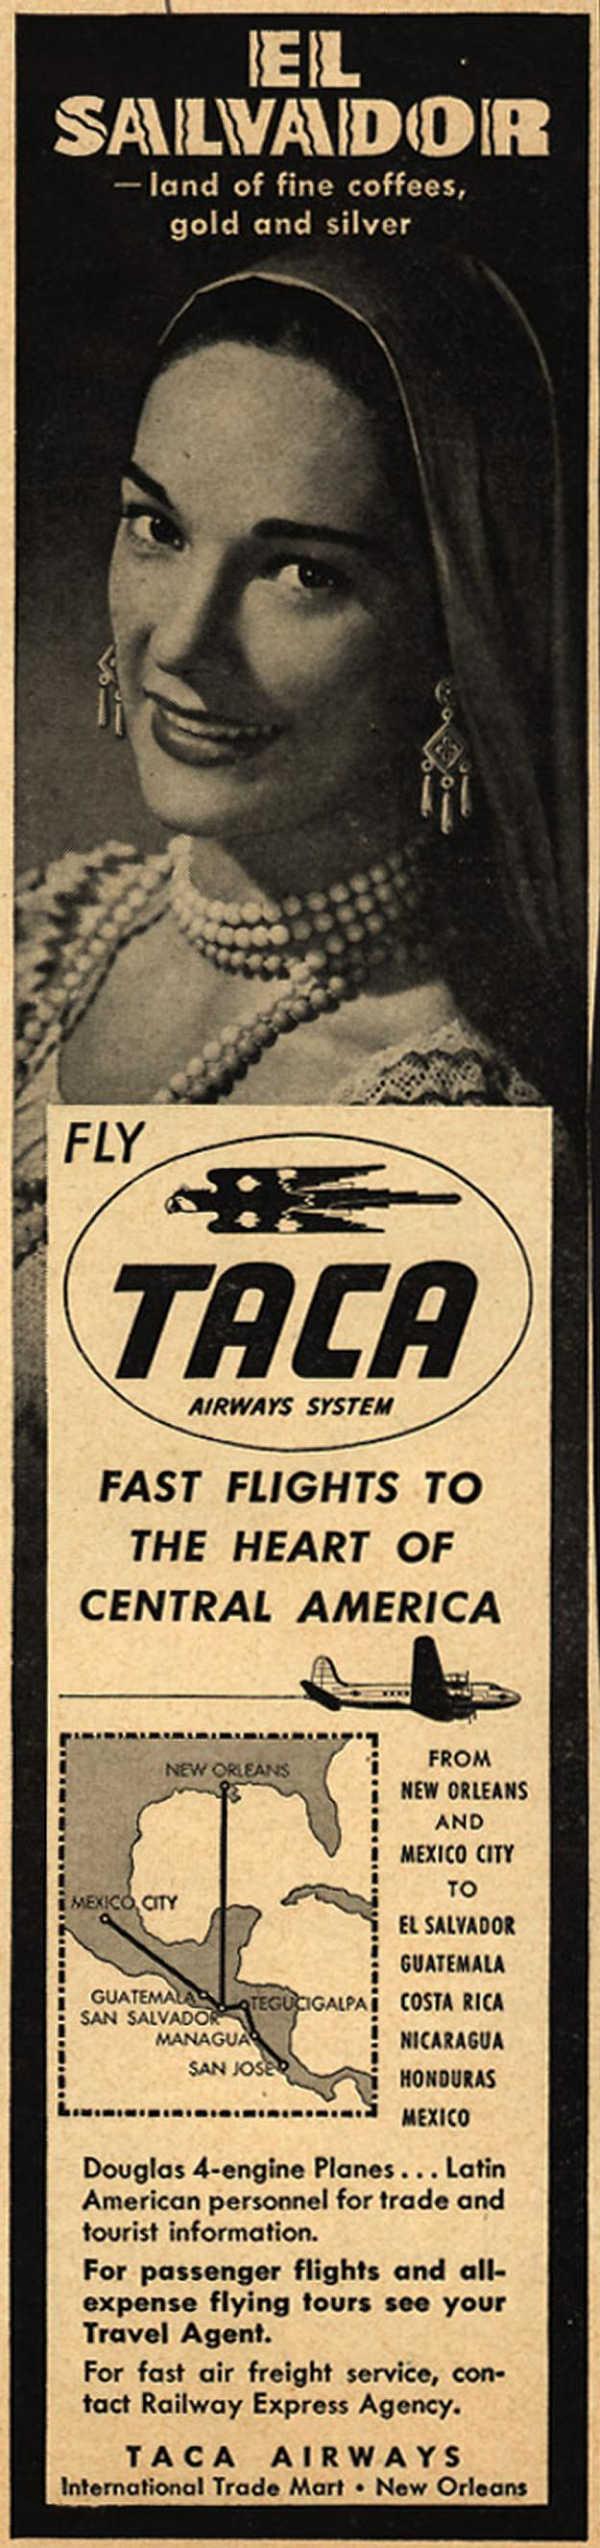 El Salvador coffee - old poster - старый рекламный плакат